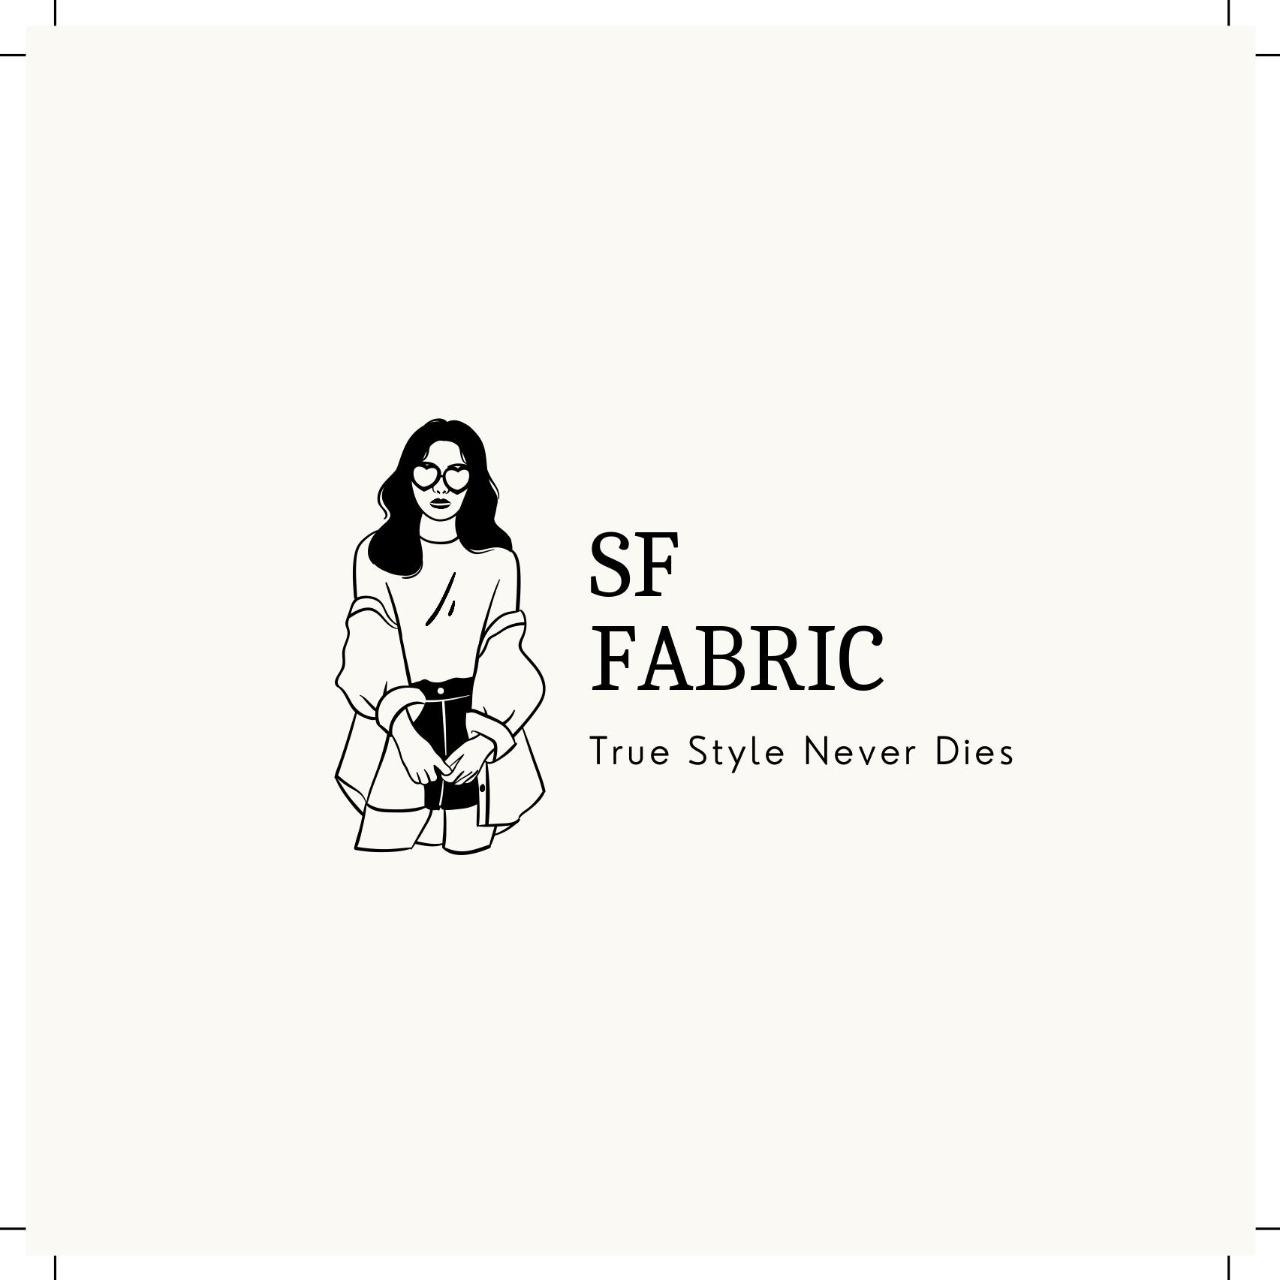 SF Fabric